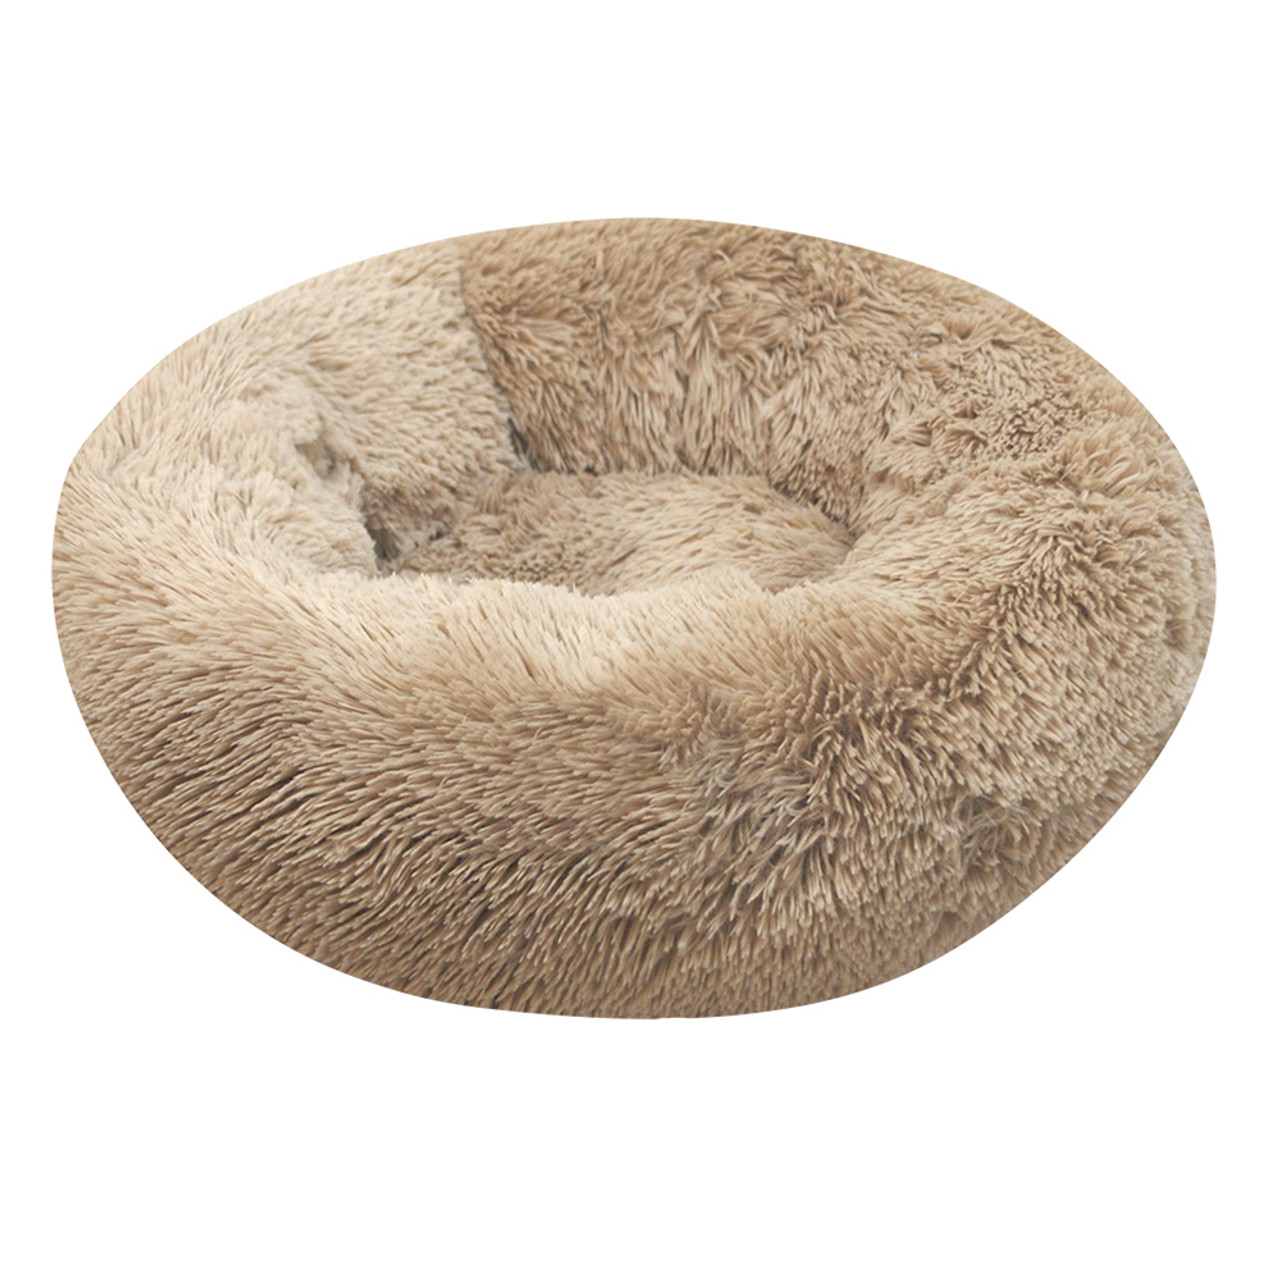 Stuft Plush Seat Pet Bed